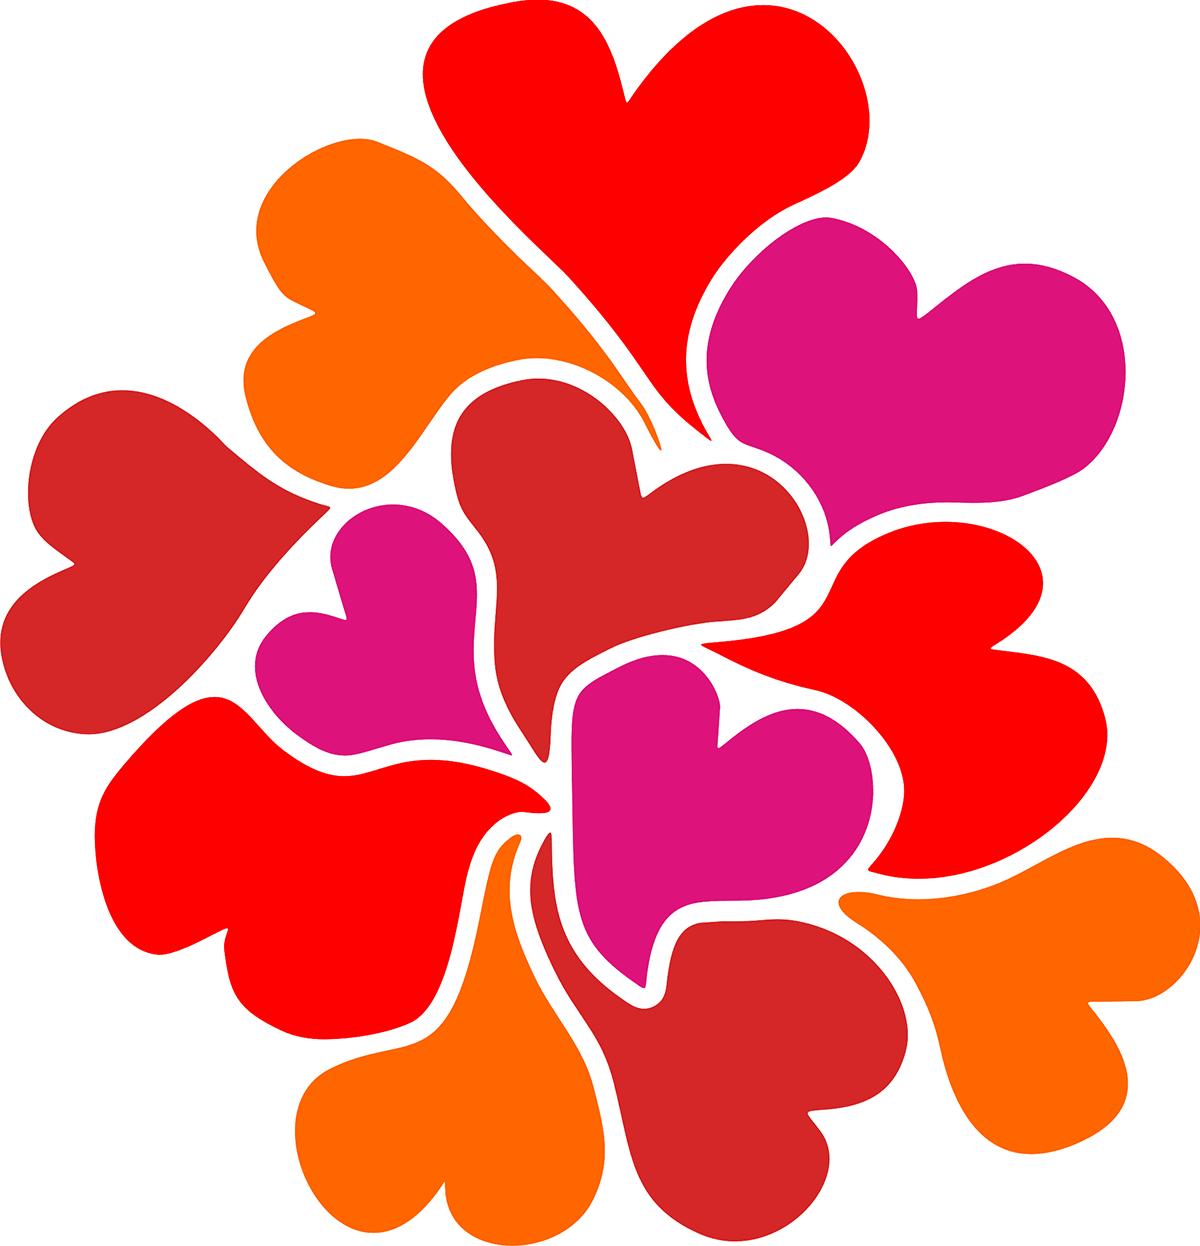 Vinilo decorativo corazones for Vinilos decorativos 3d